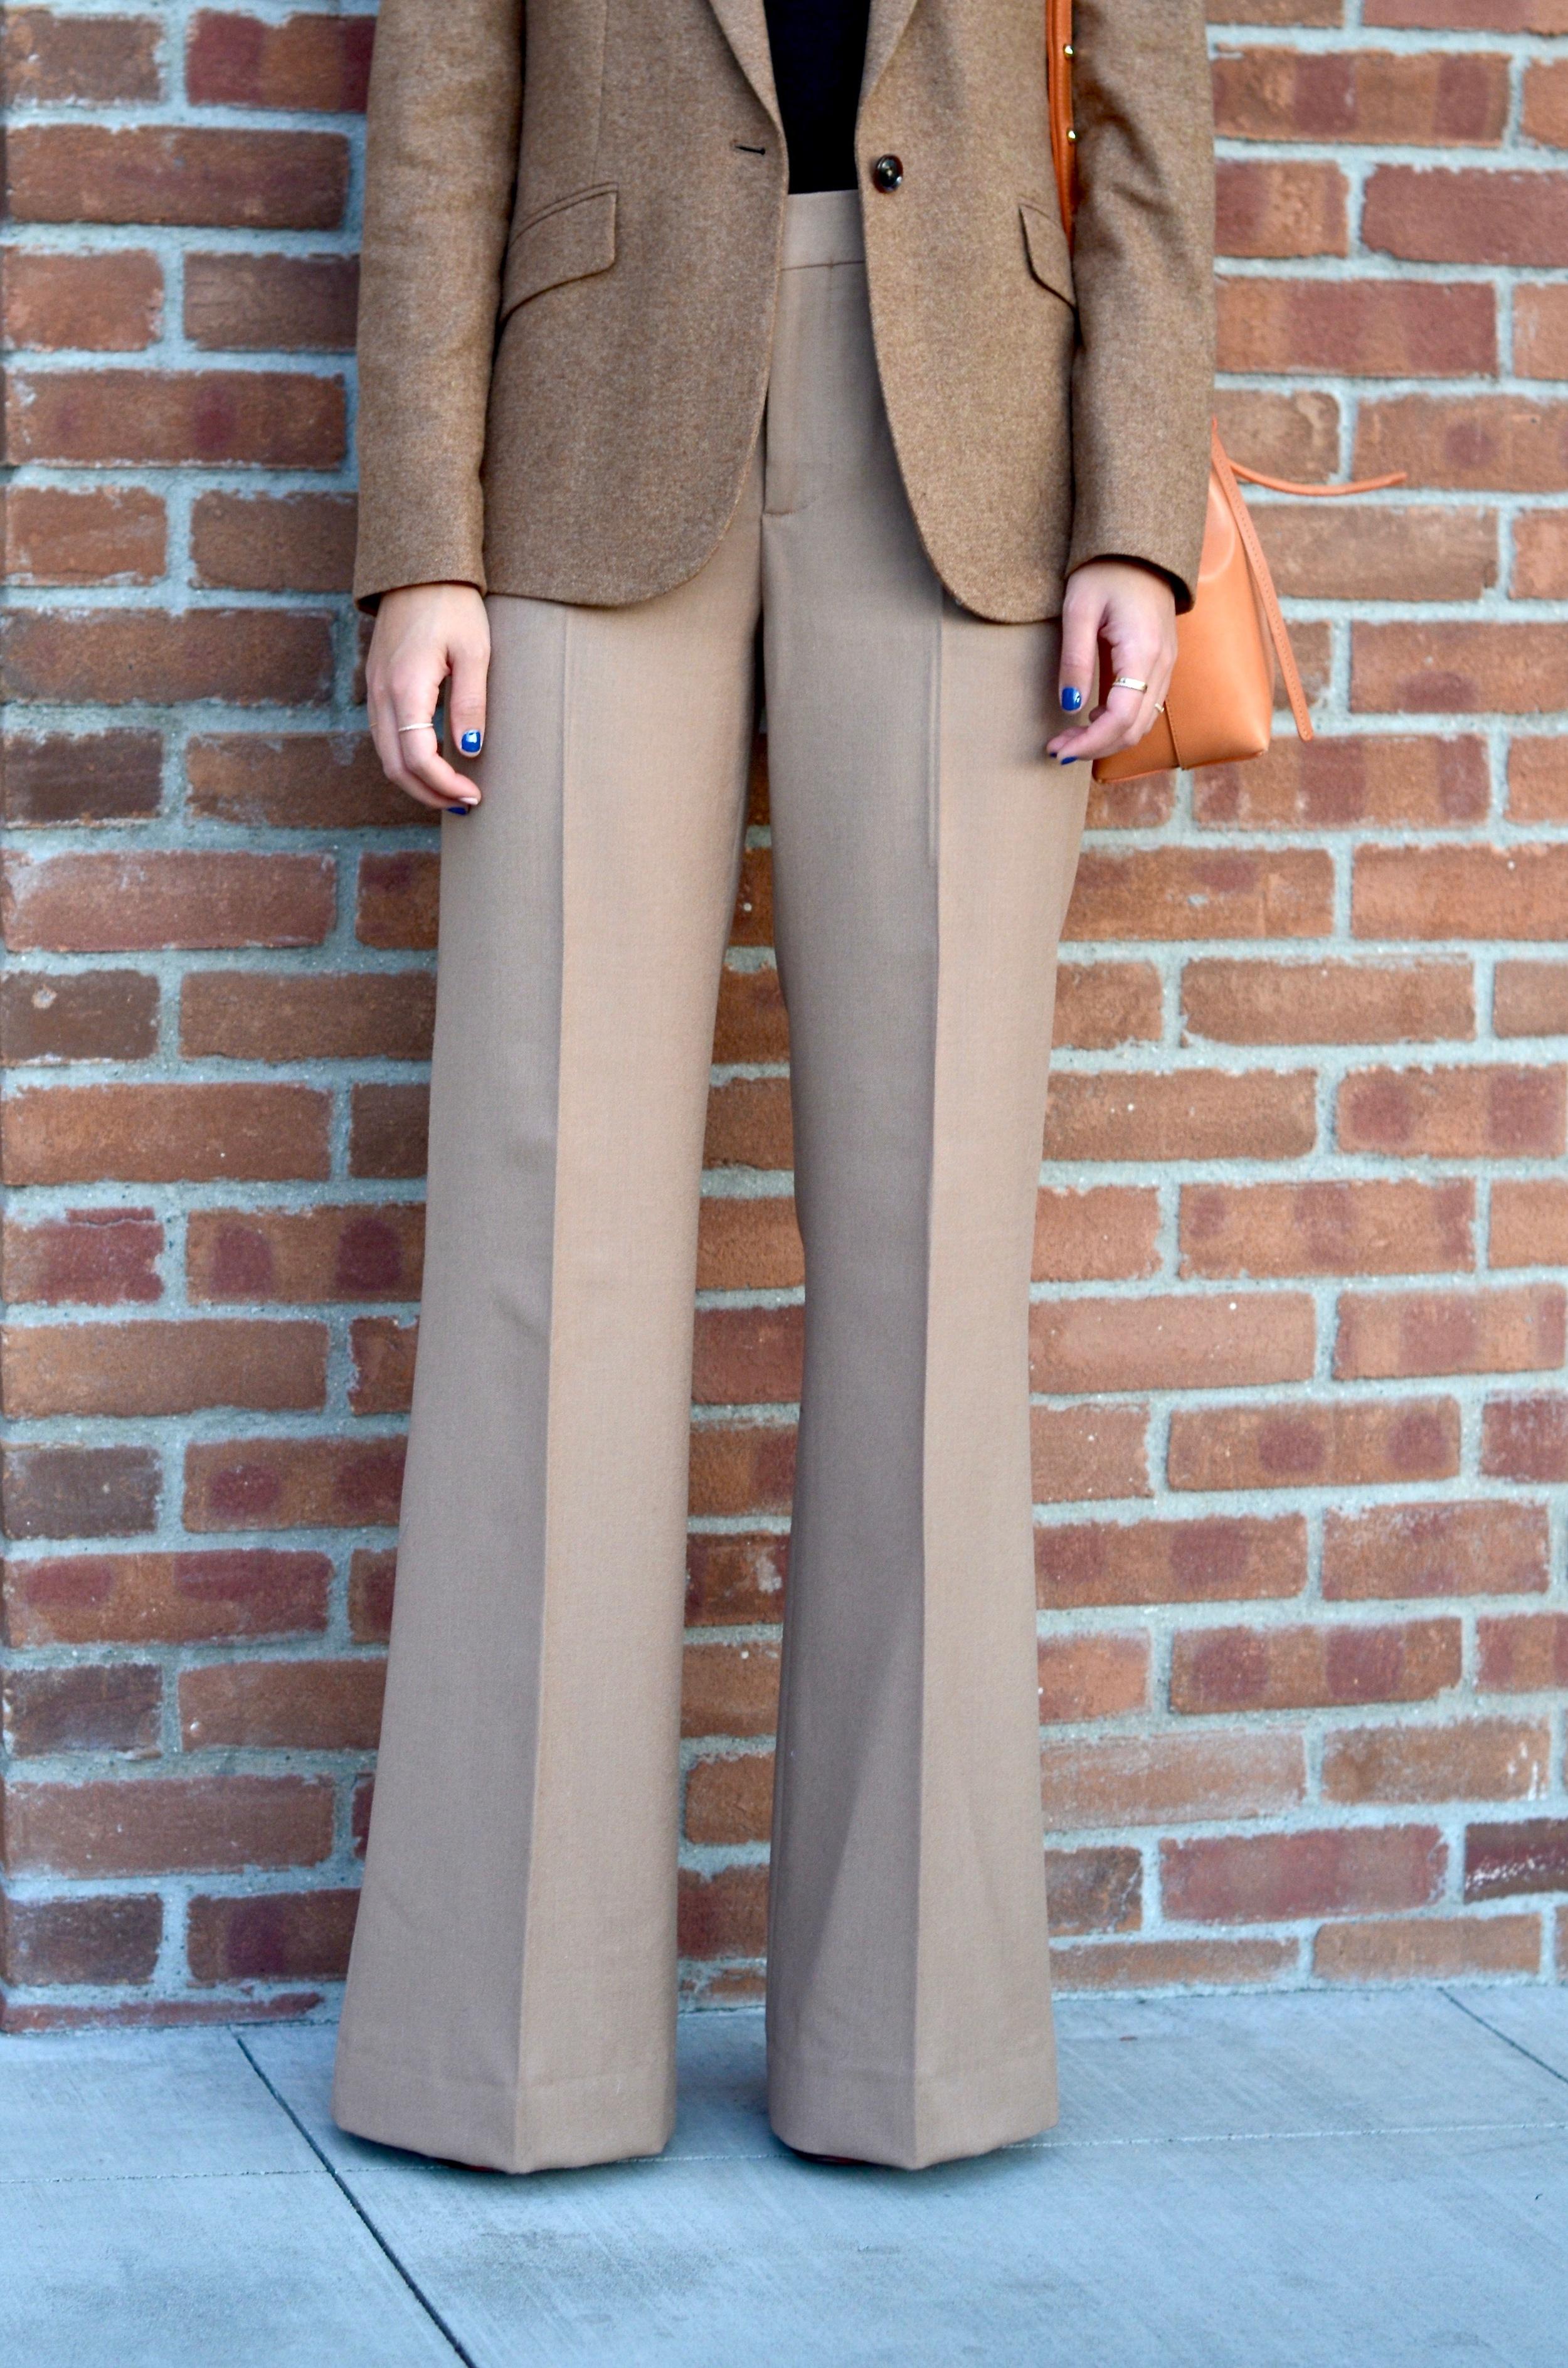 Just Goh With It-Outfit-shopstyle-dressforsuccess-zara-camel-wide-leg-pants-massimo-dutti-blazer-mansur-gavriel-mini-bucket-bag-2.jpg